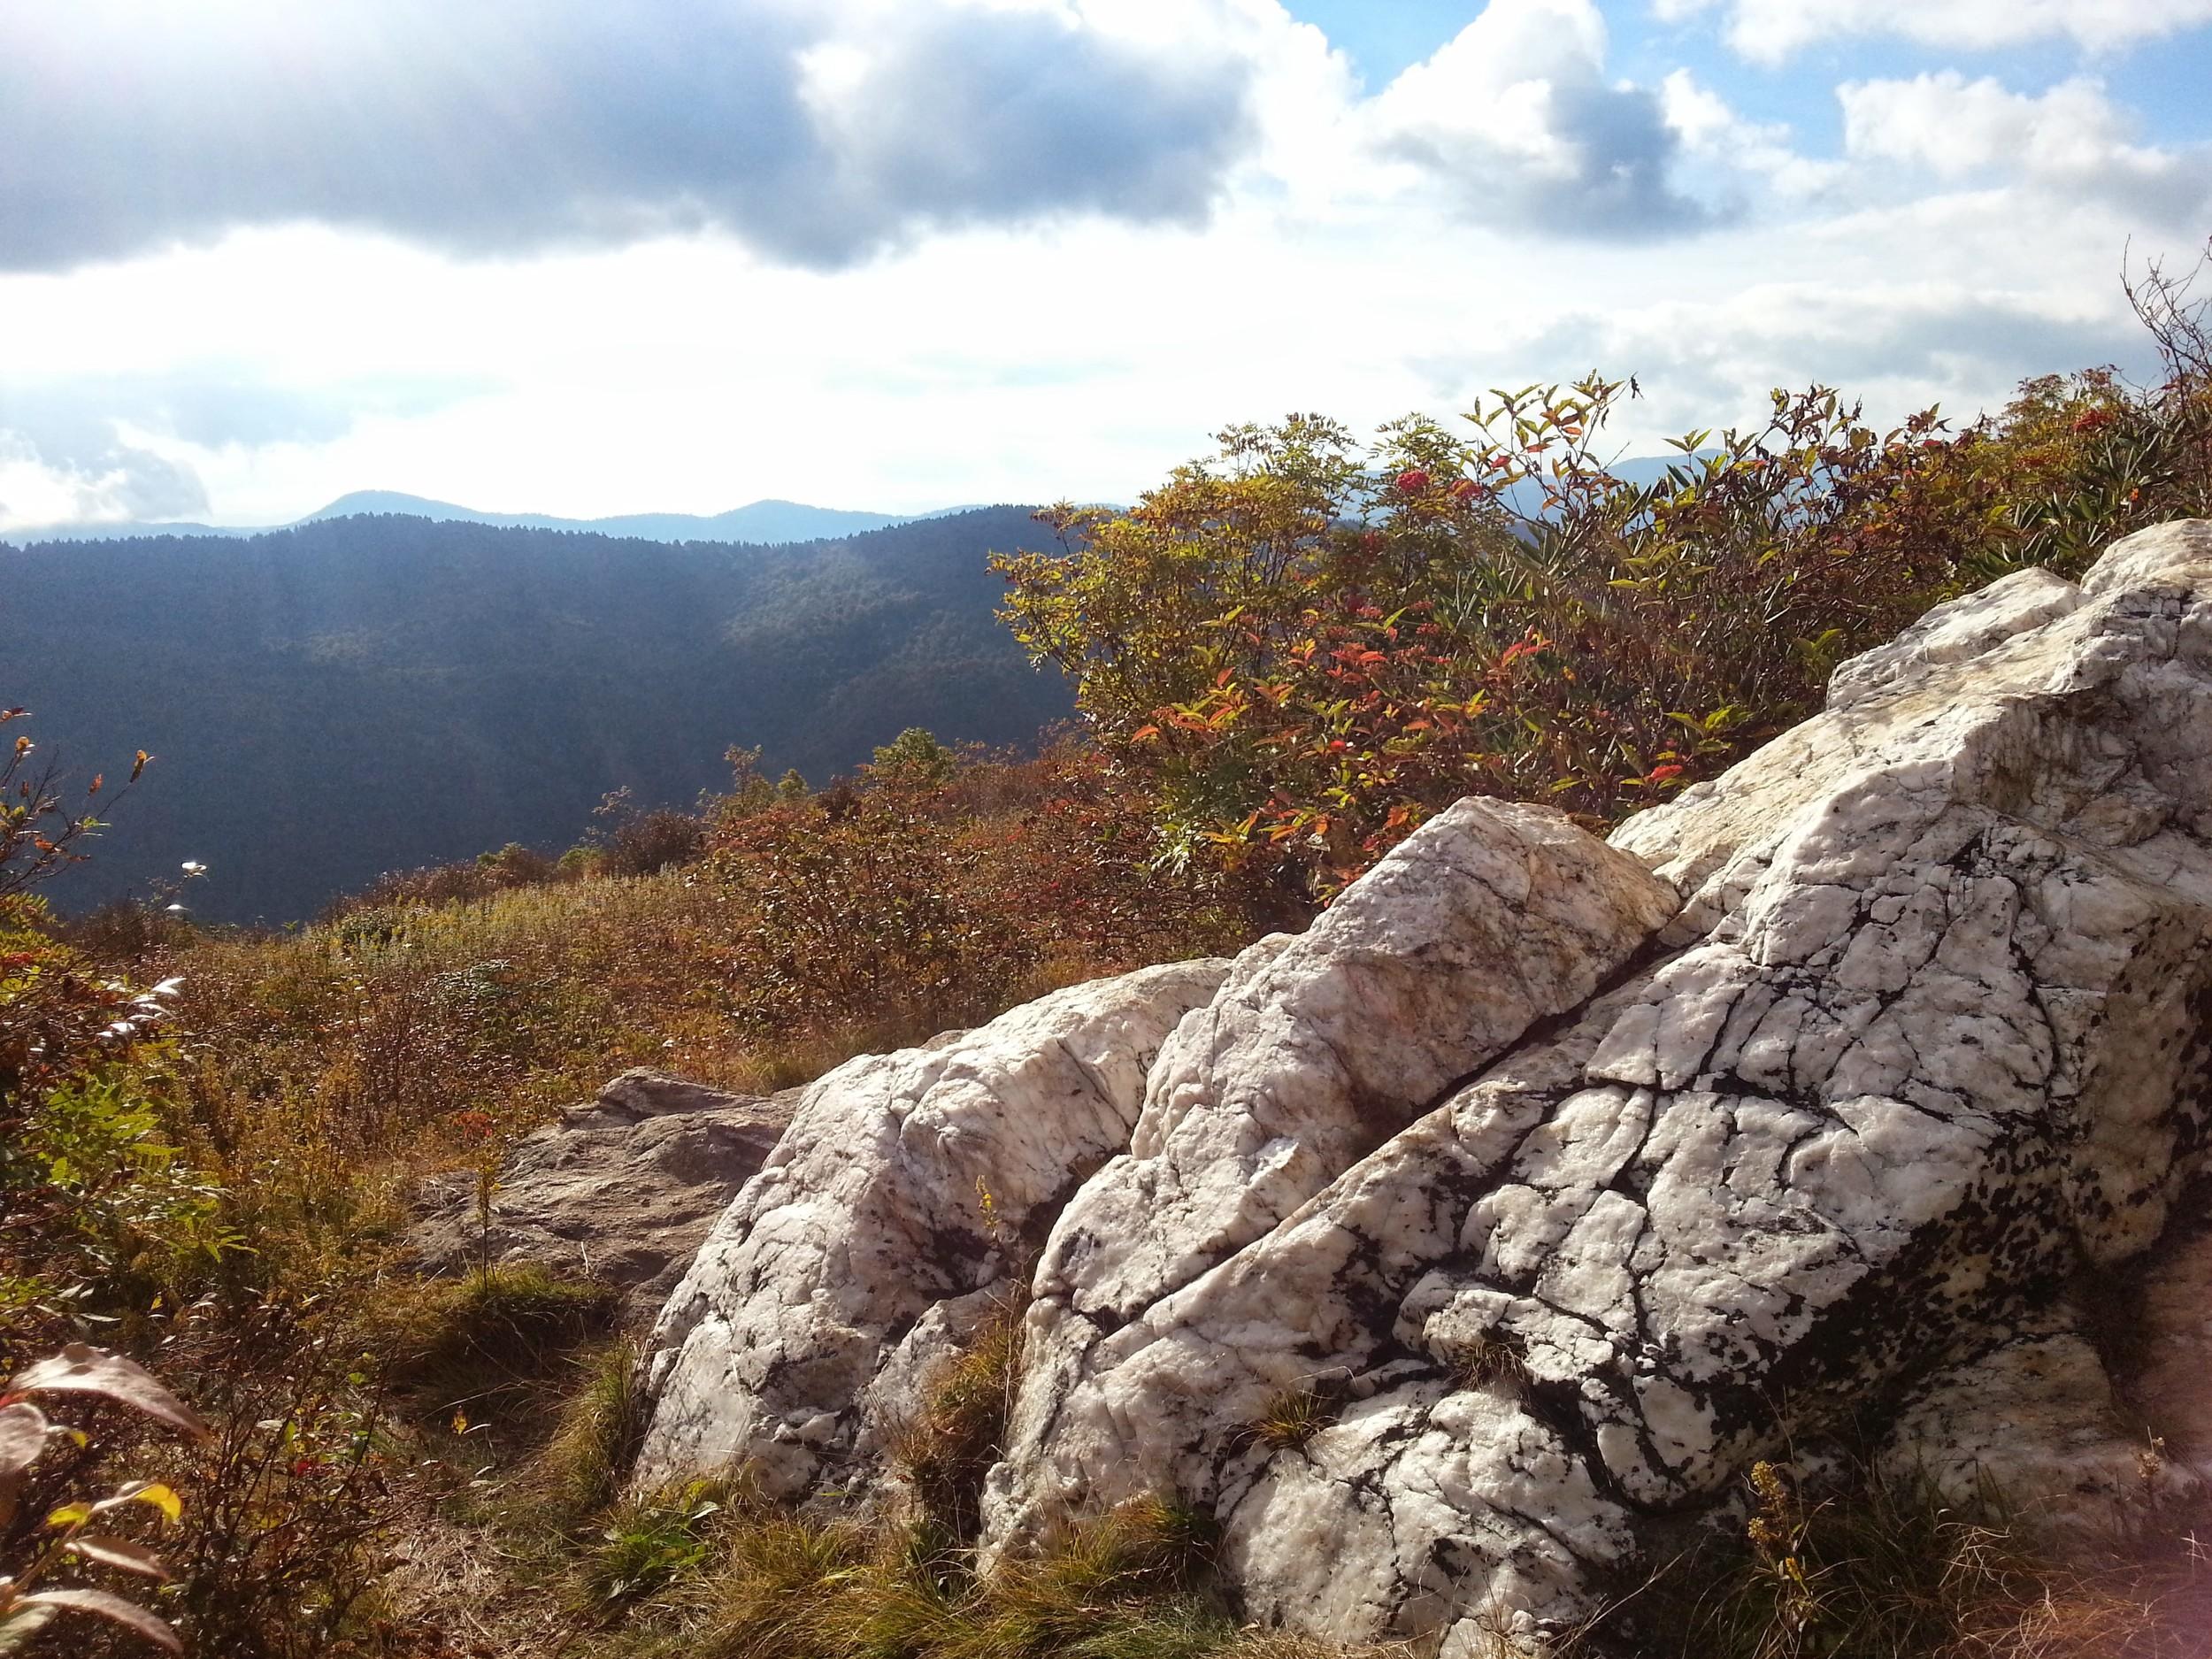 An outcrop of quartz